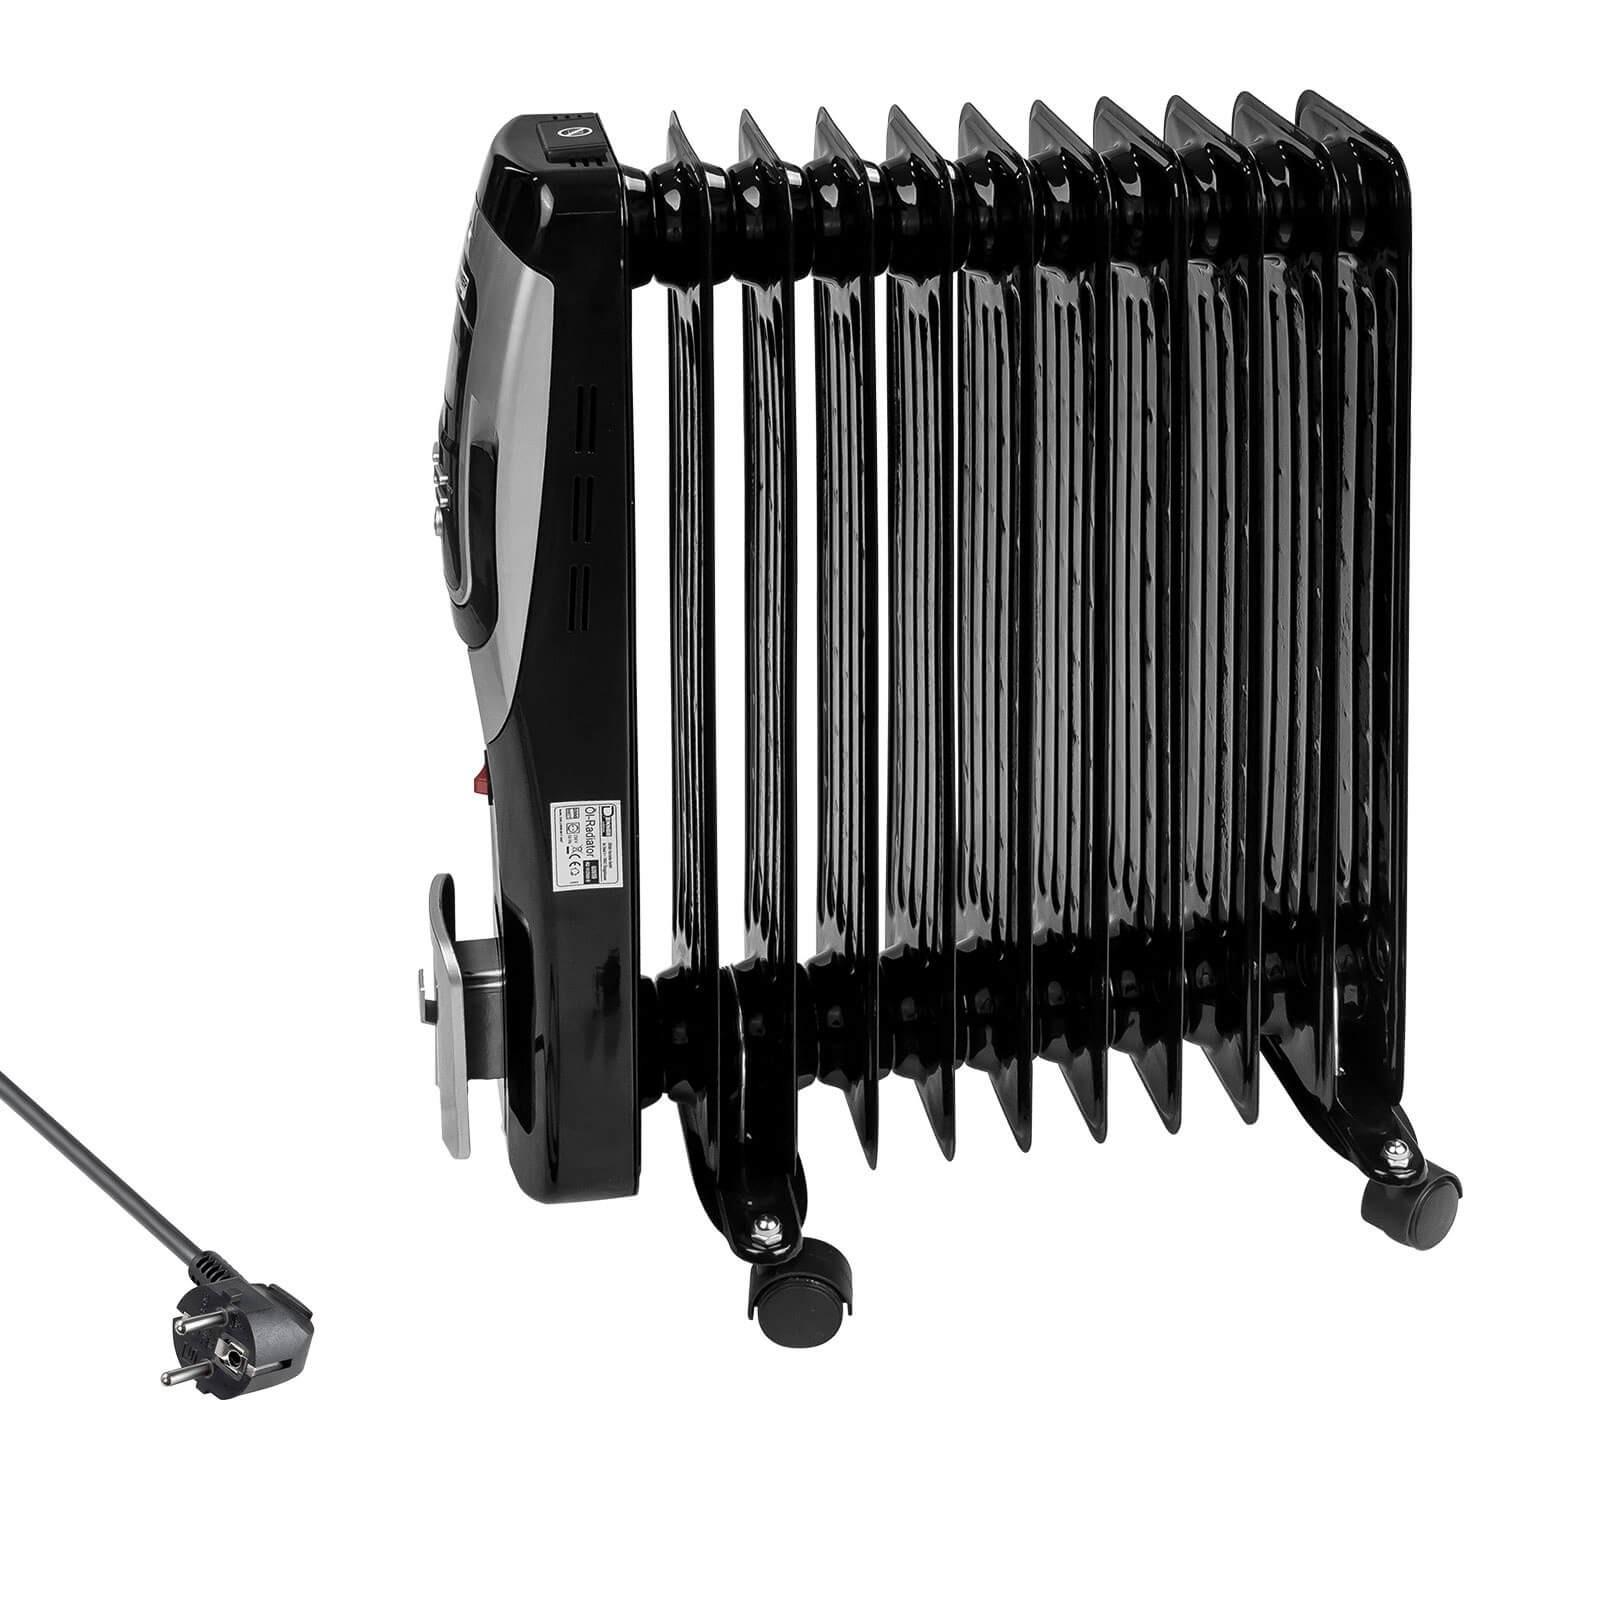 Denner-Edition Ölradiator Elektroheizung Elektroheizkörper Heizkörper Heizer 11 Rippen 2500W 60959